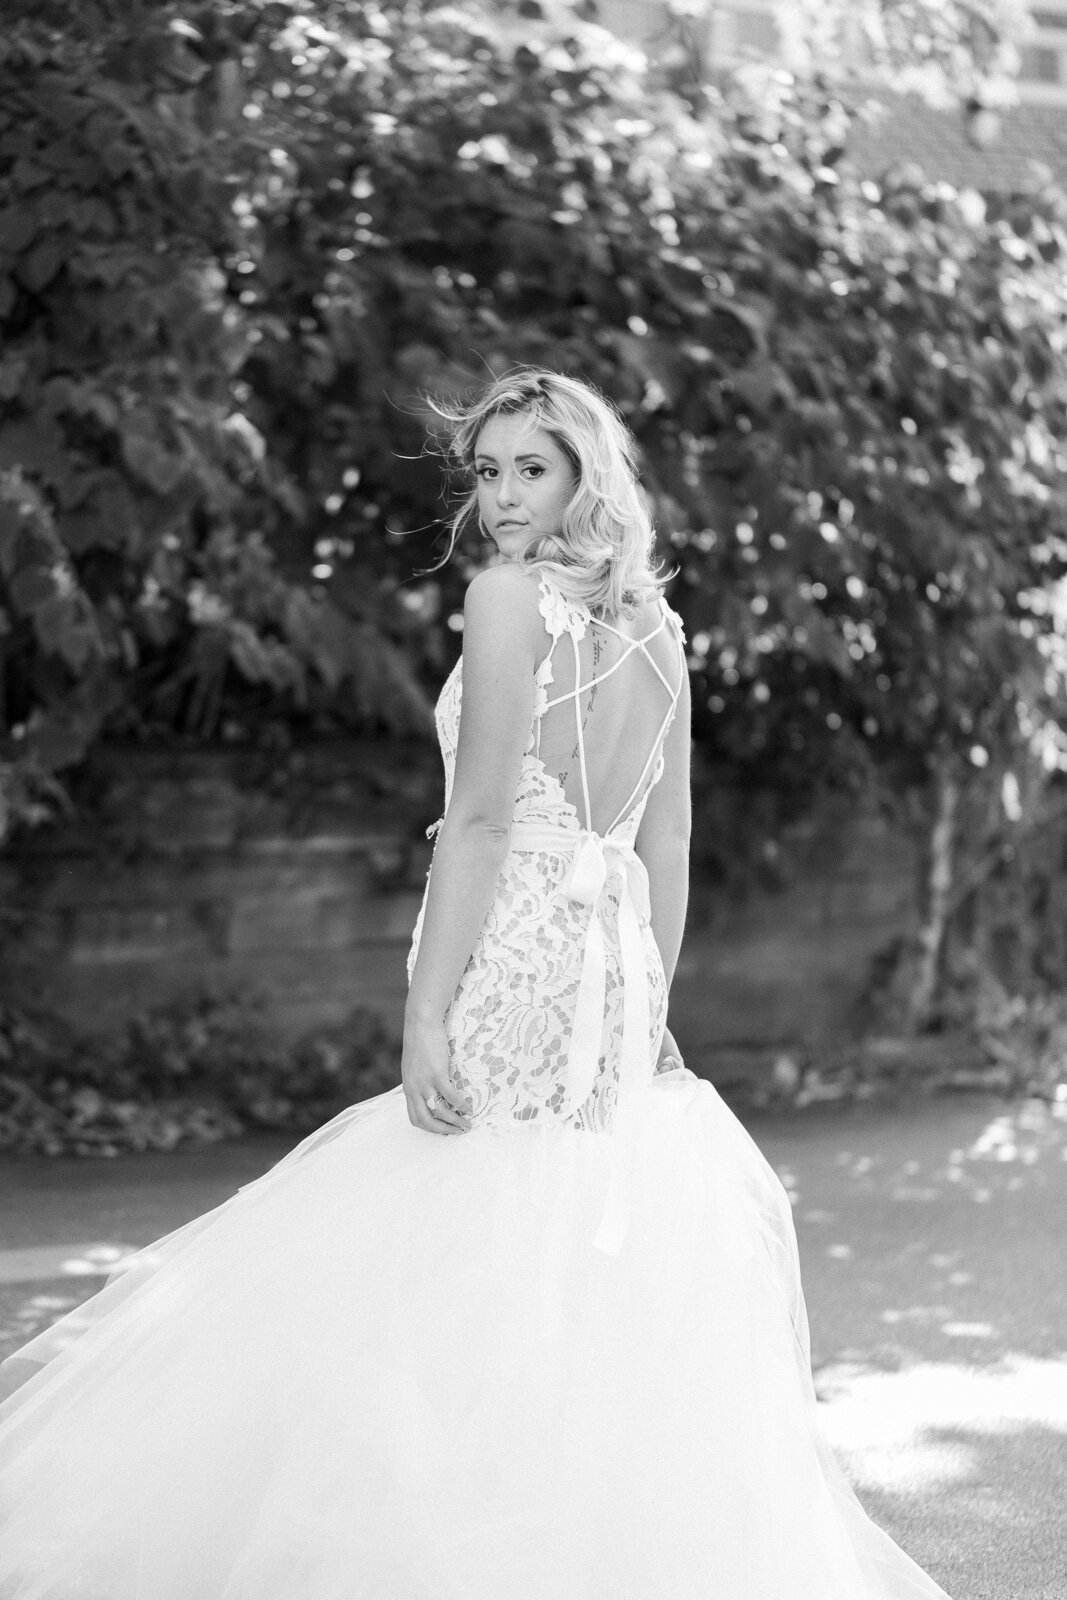 Cleveland+Wedding+Dress+Boutique,+Radiant+Bride+by+Cleveland+Wedding+Photographer+Matt+Erickson+Photography.jpg